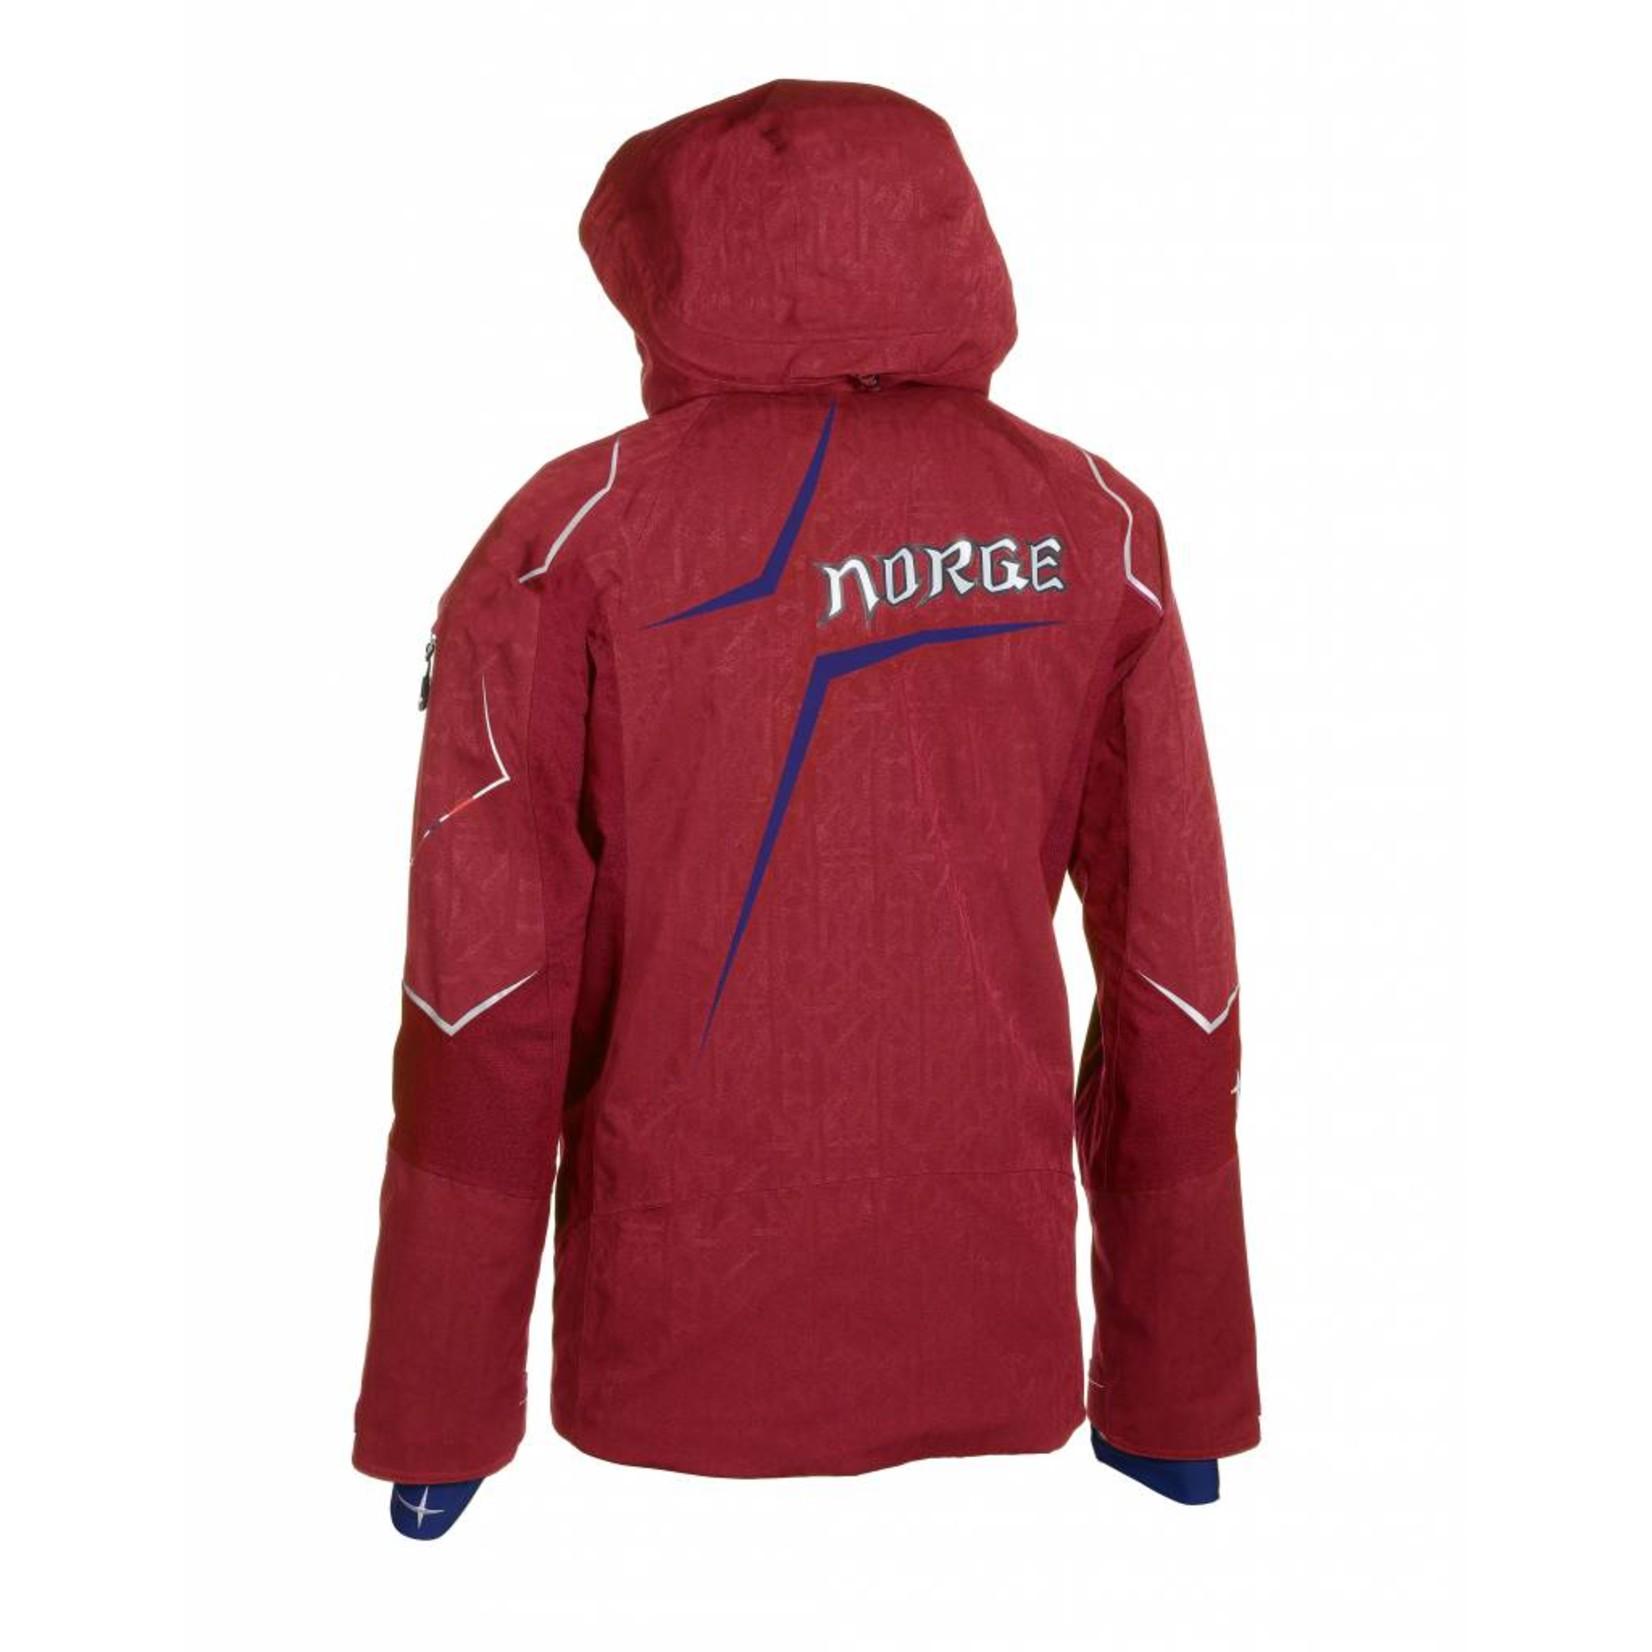 PHENIX  Norway Alpine Team Jacket 3 in 1 - BO1